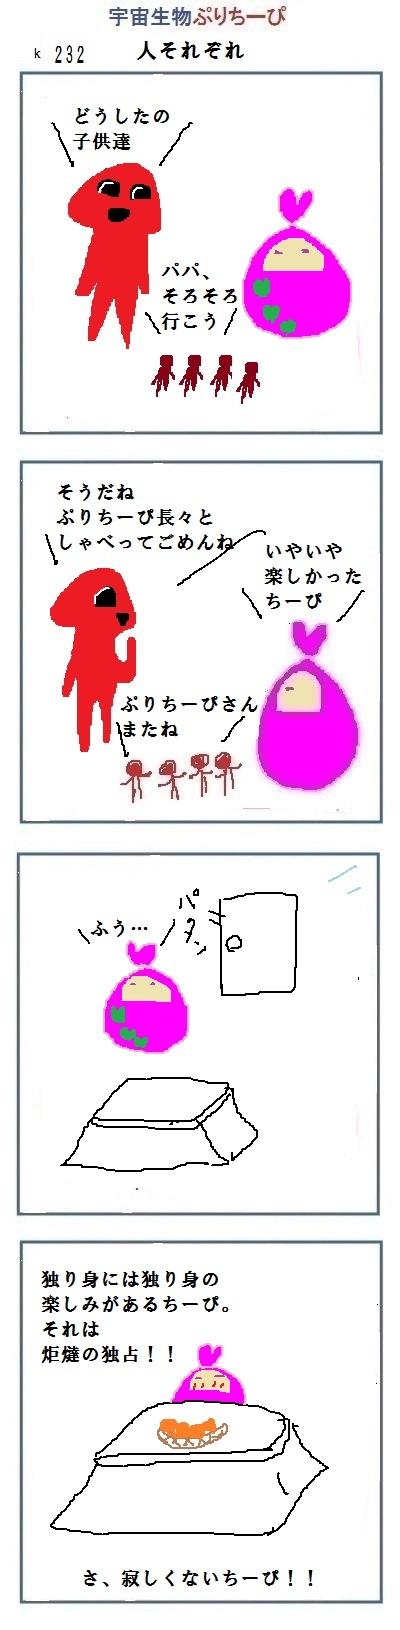 2017010610041349c.jpg